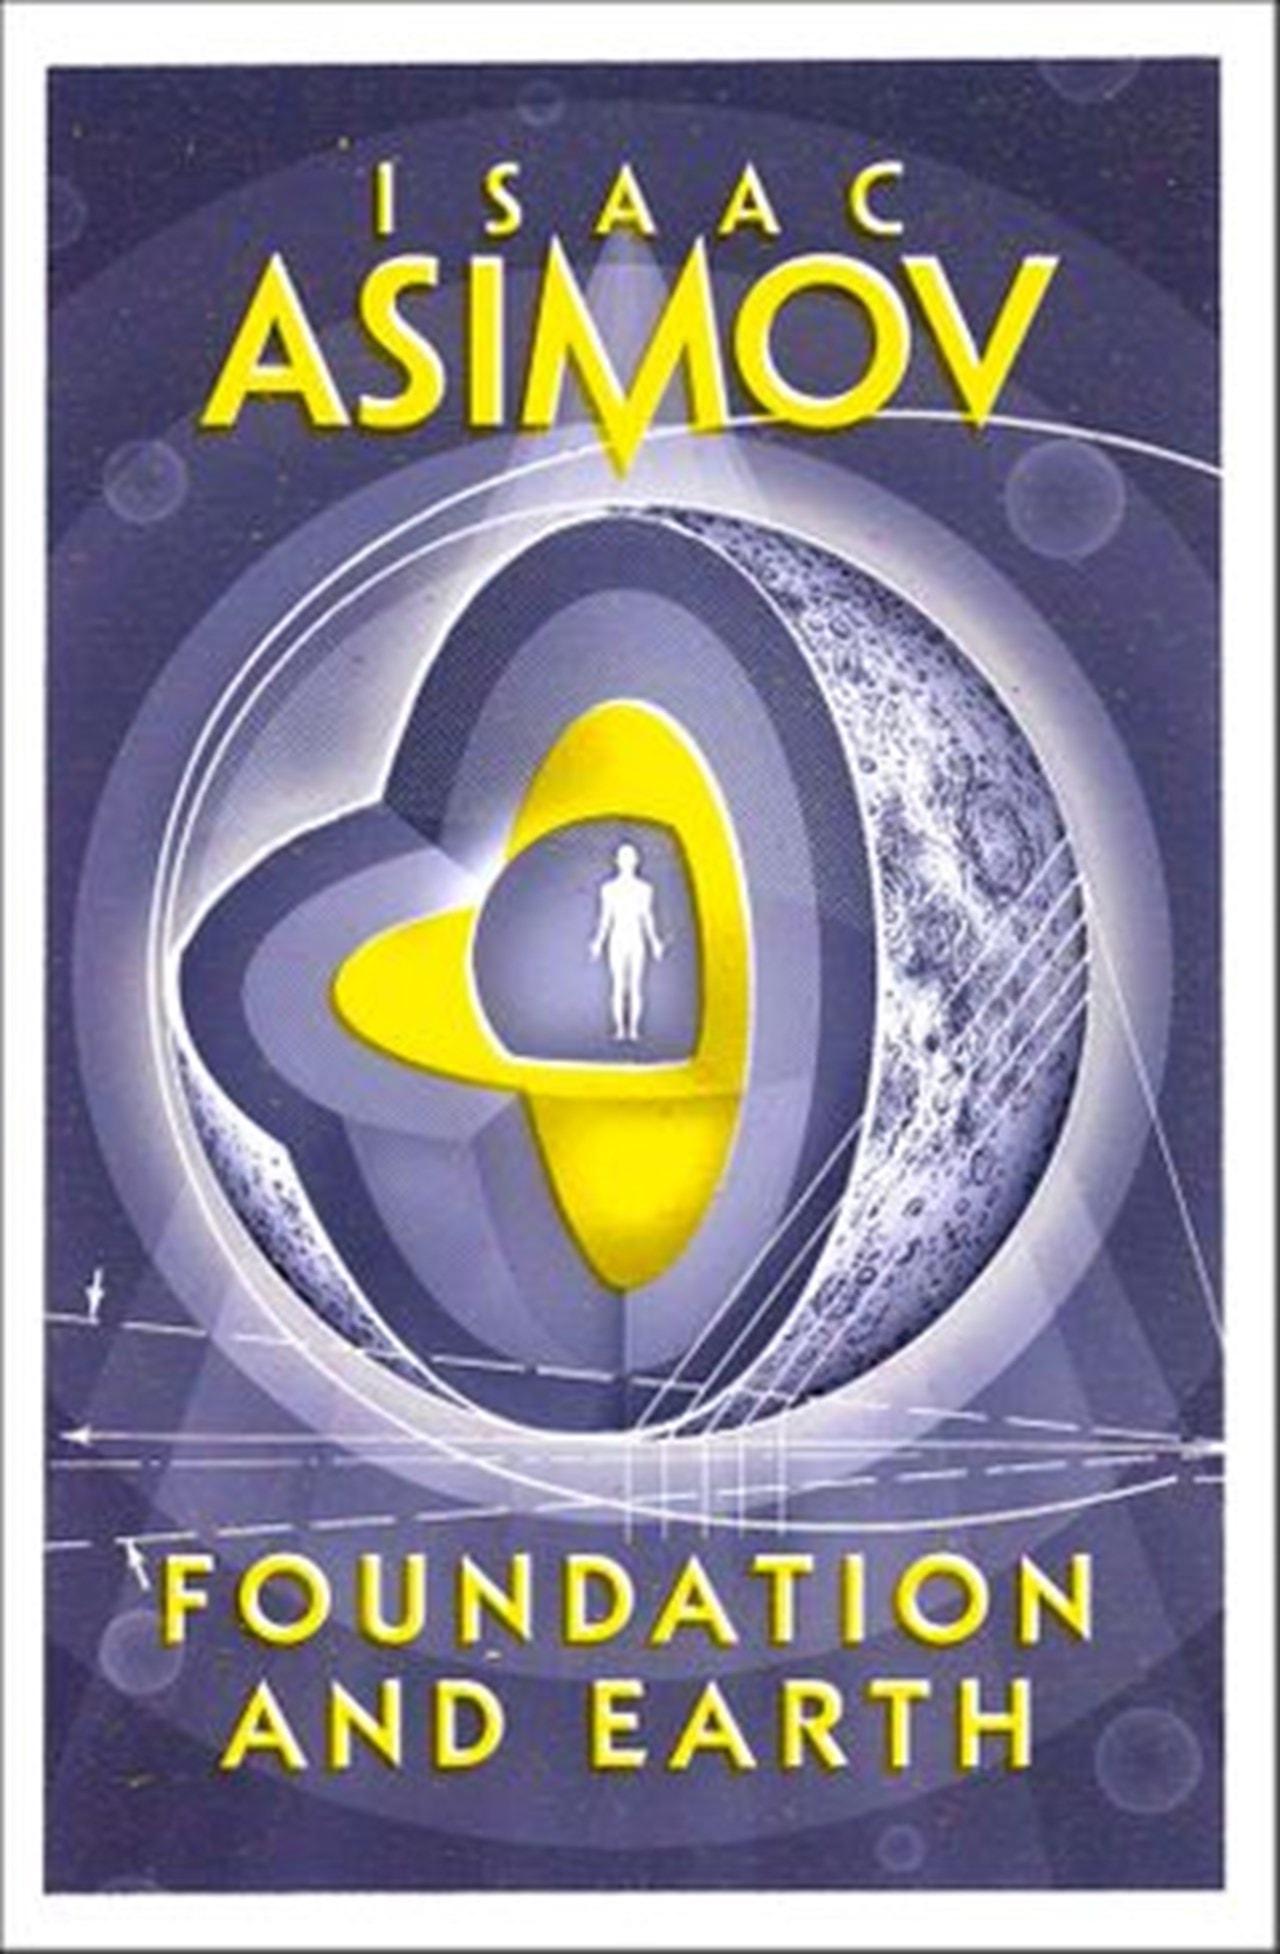 Foundation & Earth - 1